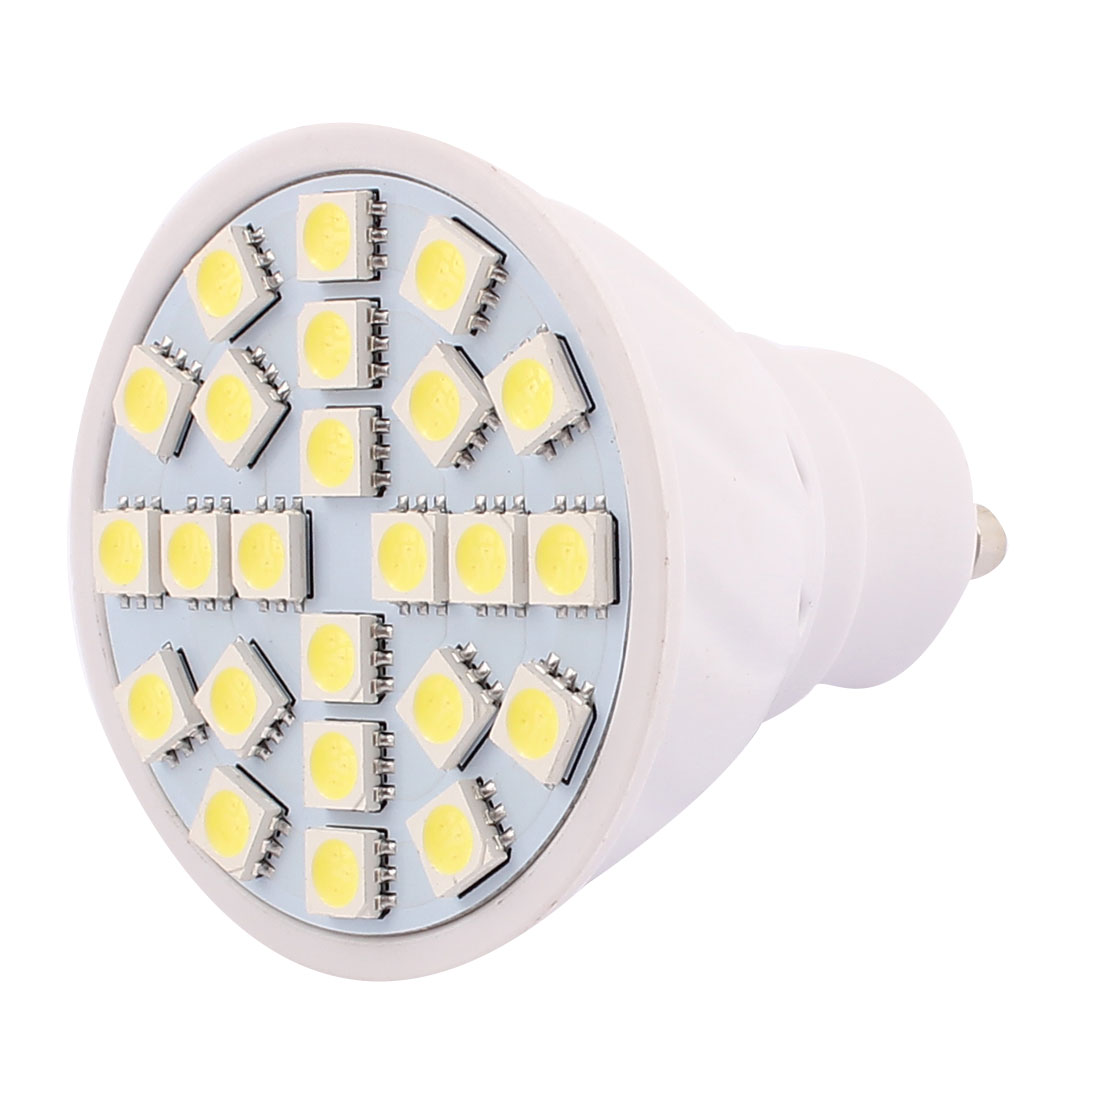 220V GU10 LED Light 3W 5050 SMD 24 LEDs Spotlight Down Lamp Bulb Energy Save Pure White